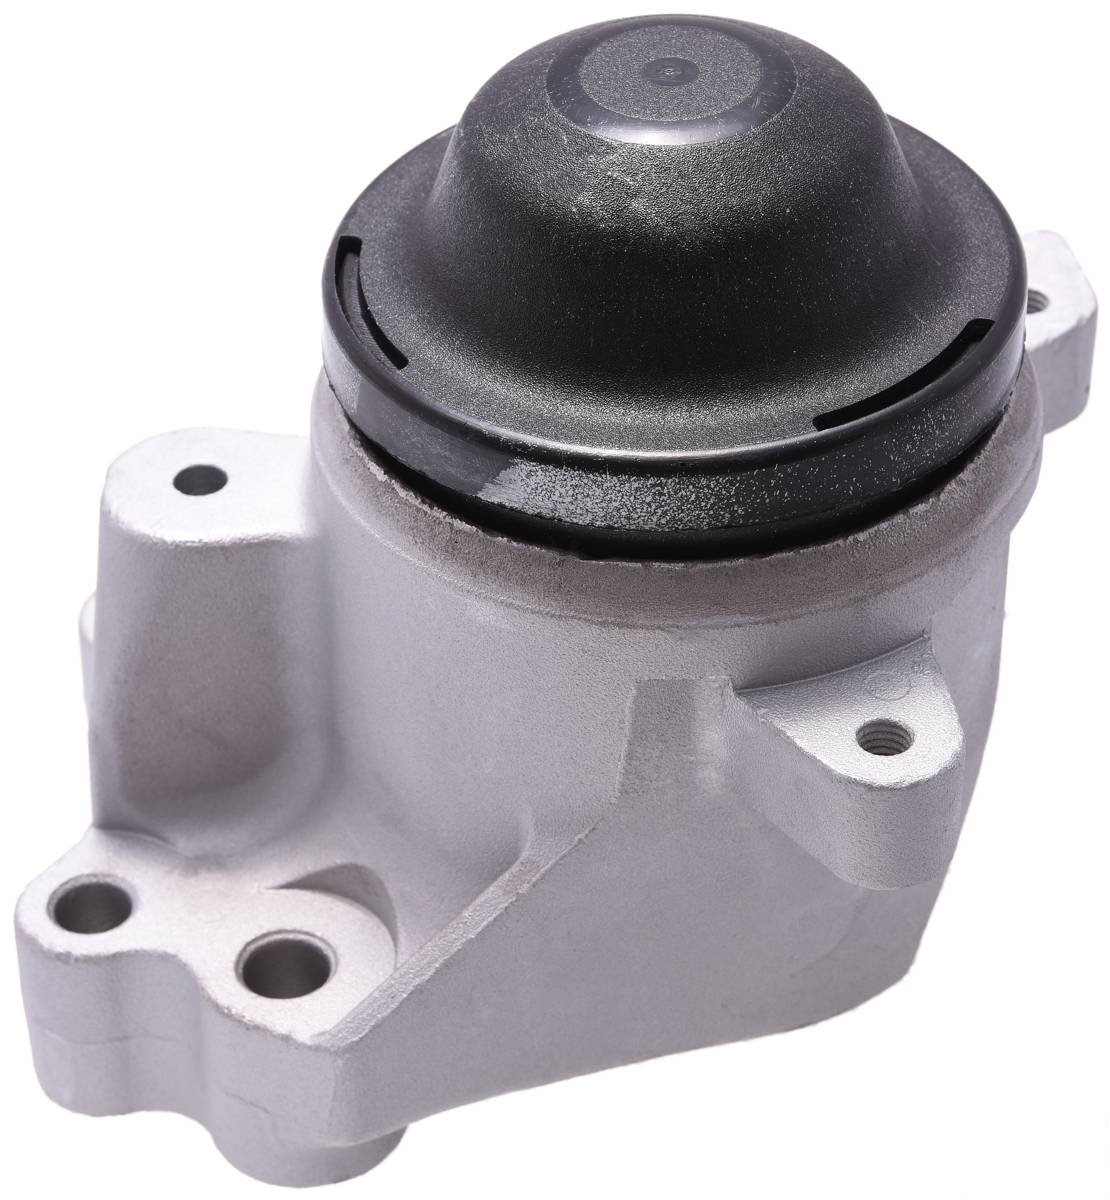 RIGHT ENGINE MOUNT - Febest # MZM-CX9RH - 1 Year Warranty